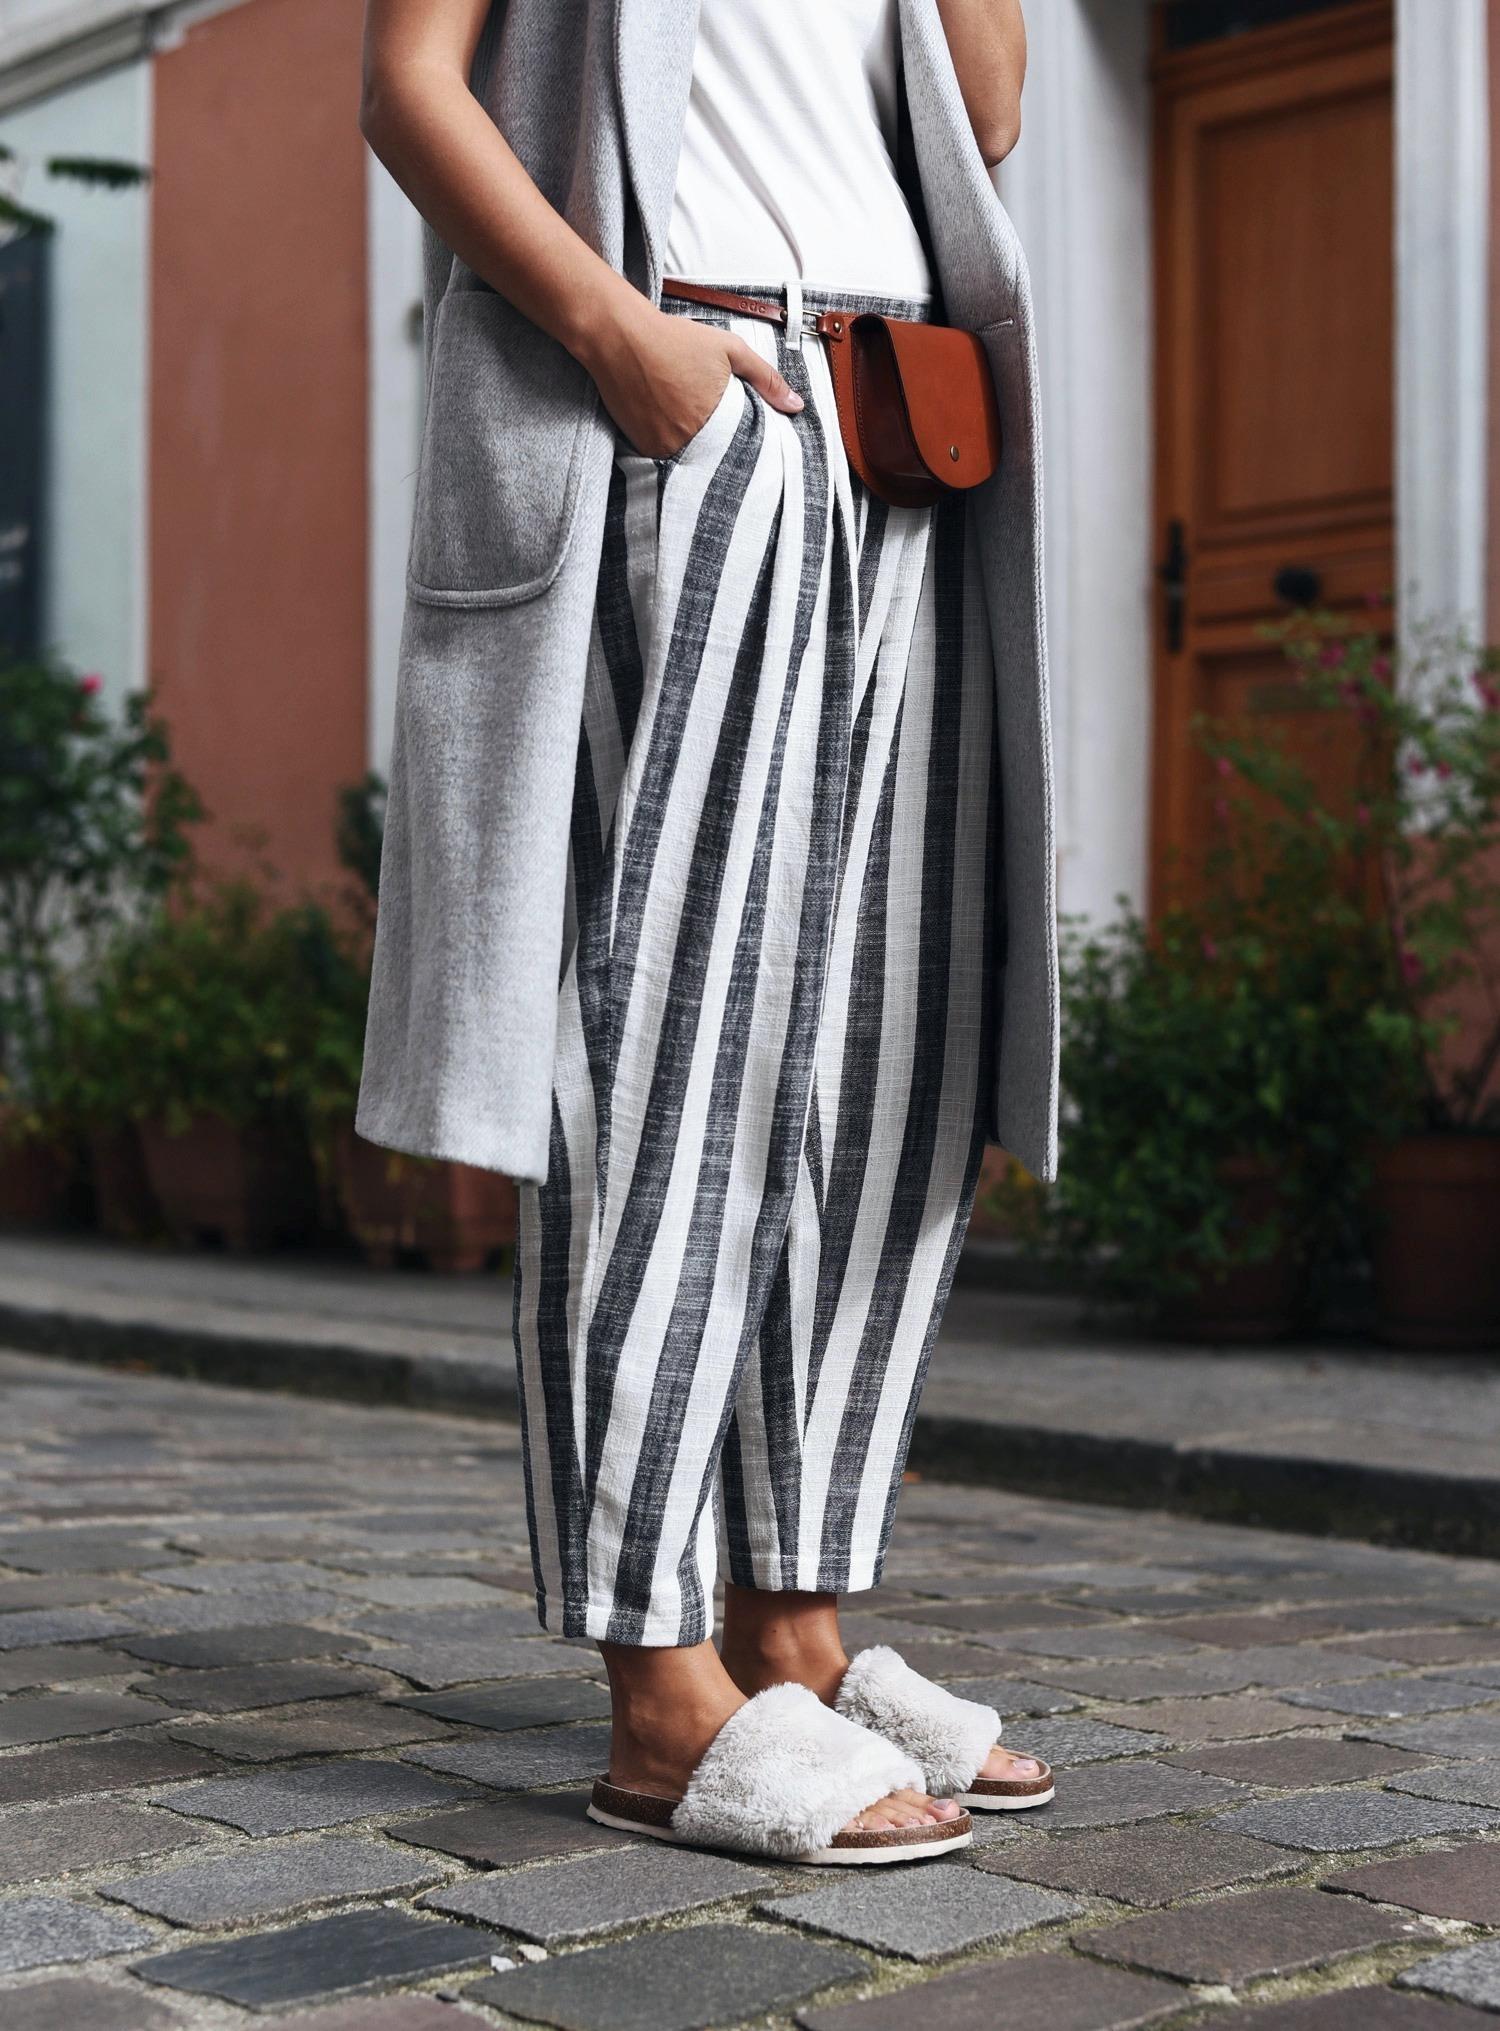 fake-fur-slipper-flats-streetstyle-blogger-style-fashiioncarpet-